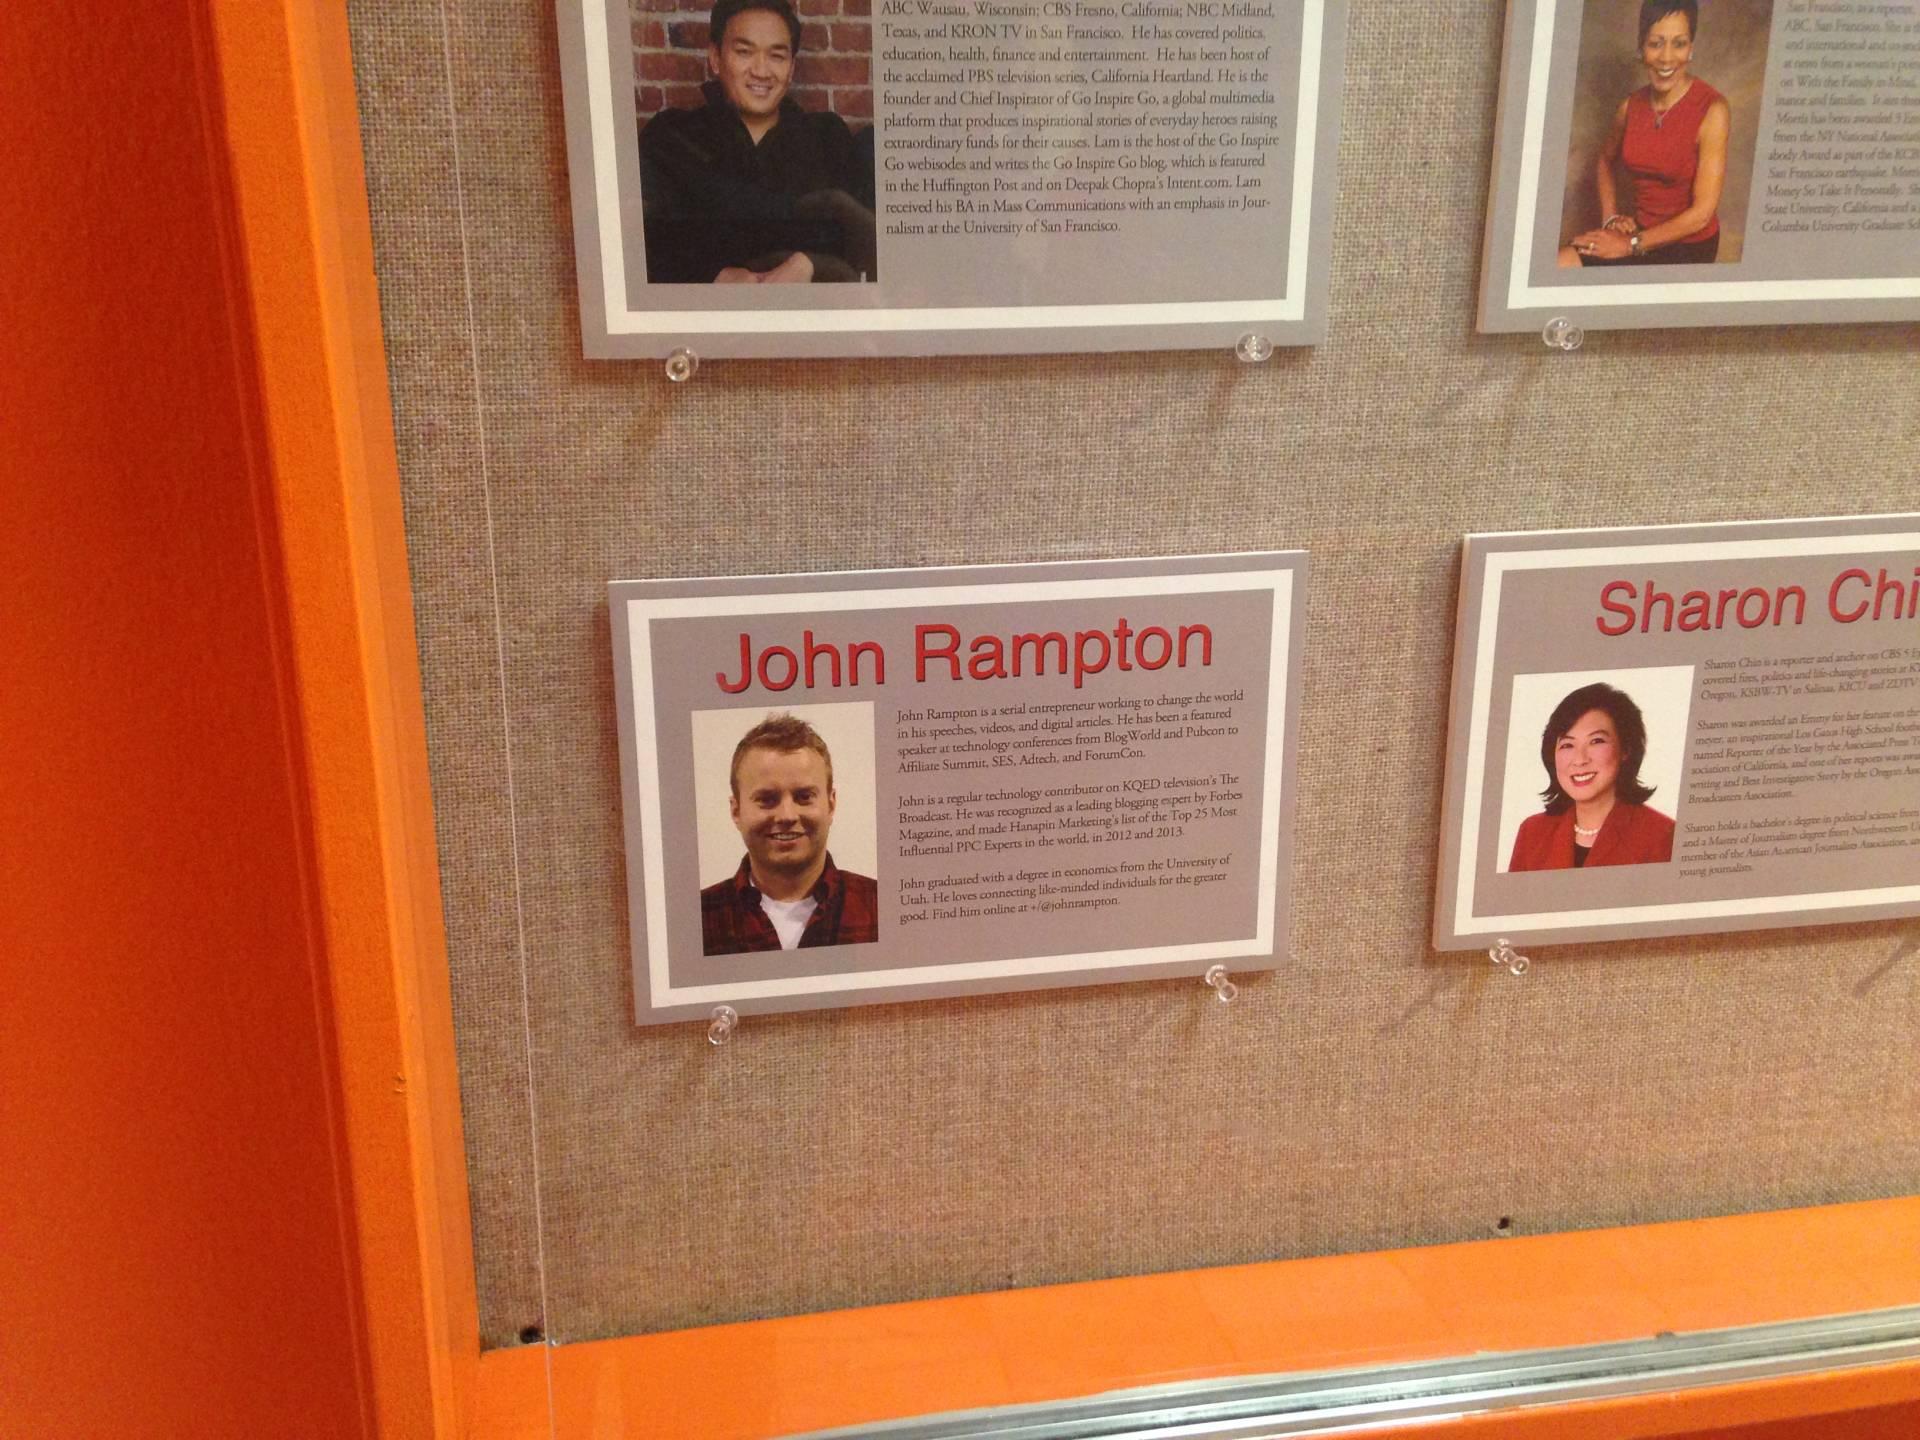 John Rampton Academy of Art University